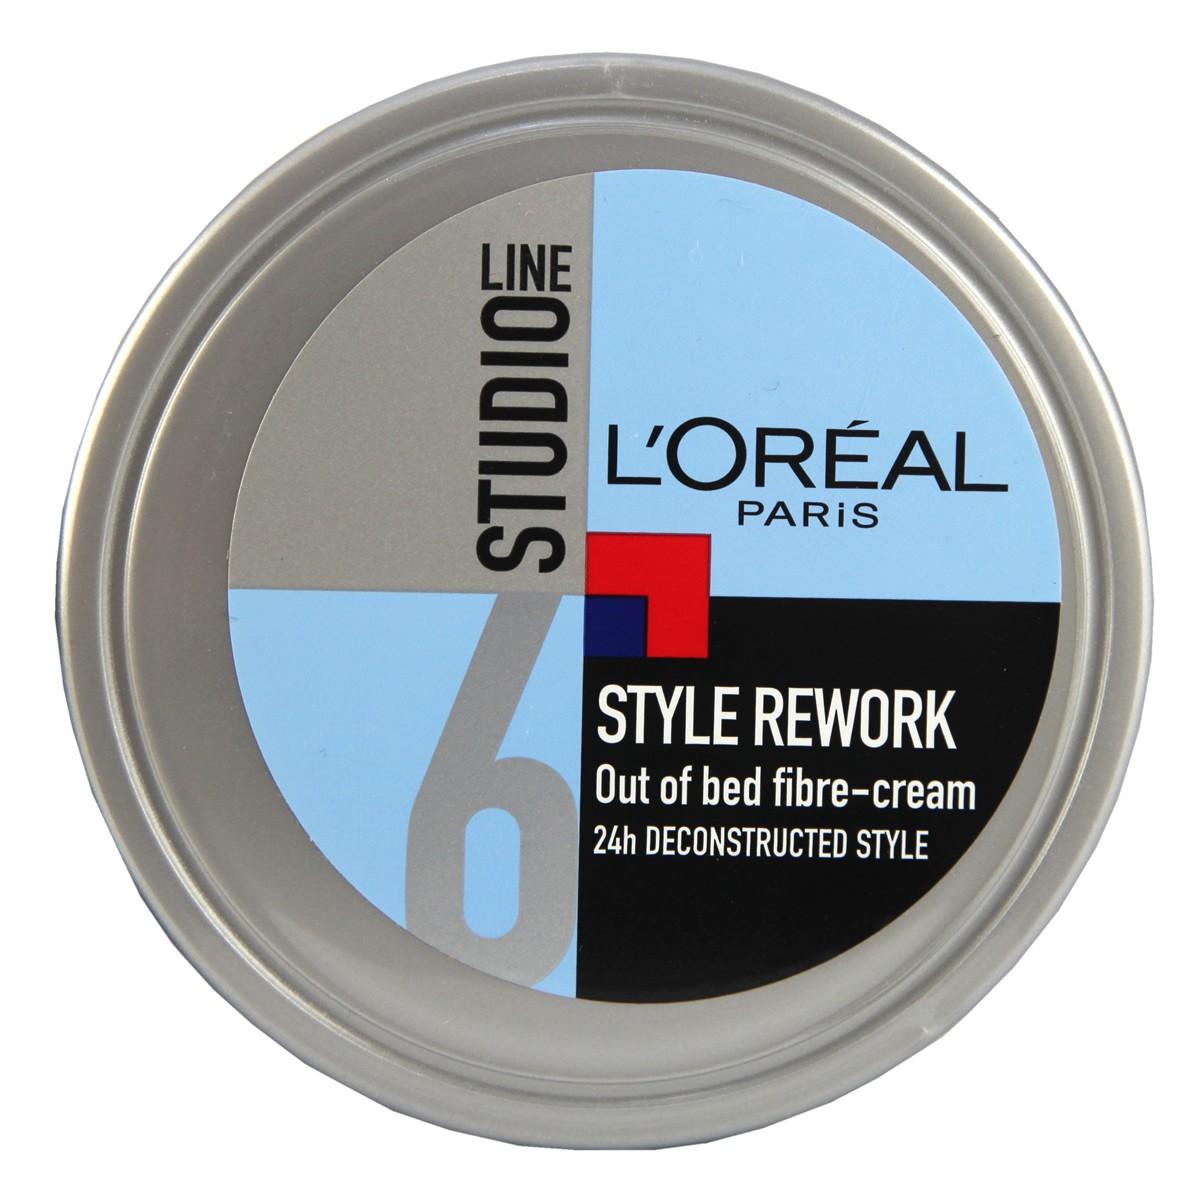 L'Oreal Paris Studio Line Style Rework Out of Bed Fibre Cream